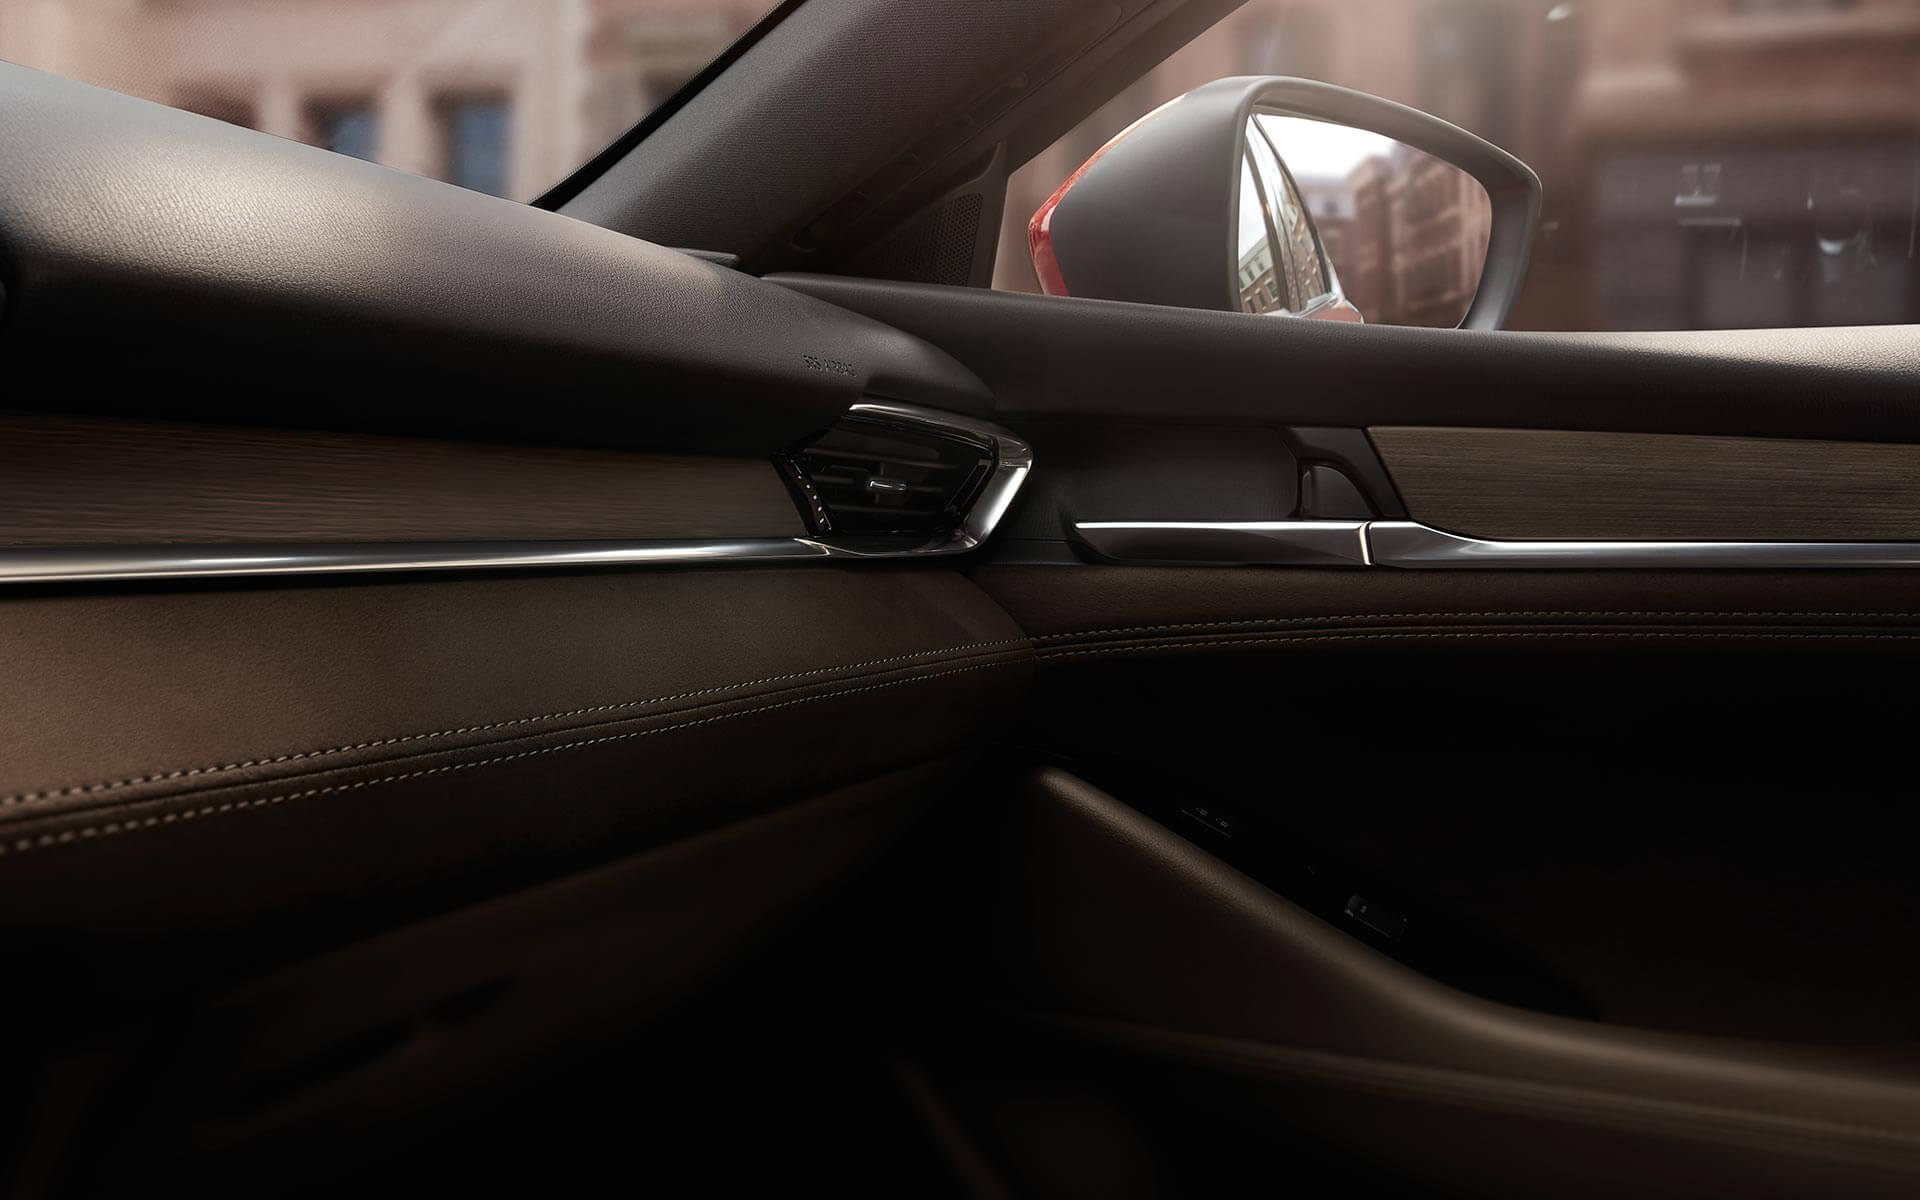 2018 Mazda 6 – aislamiento de sonido